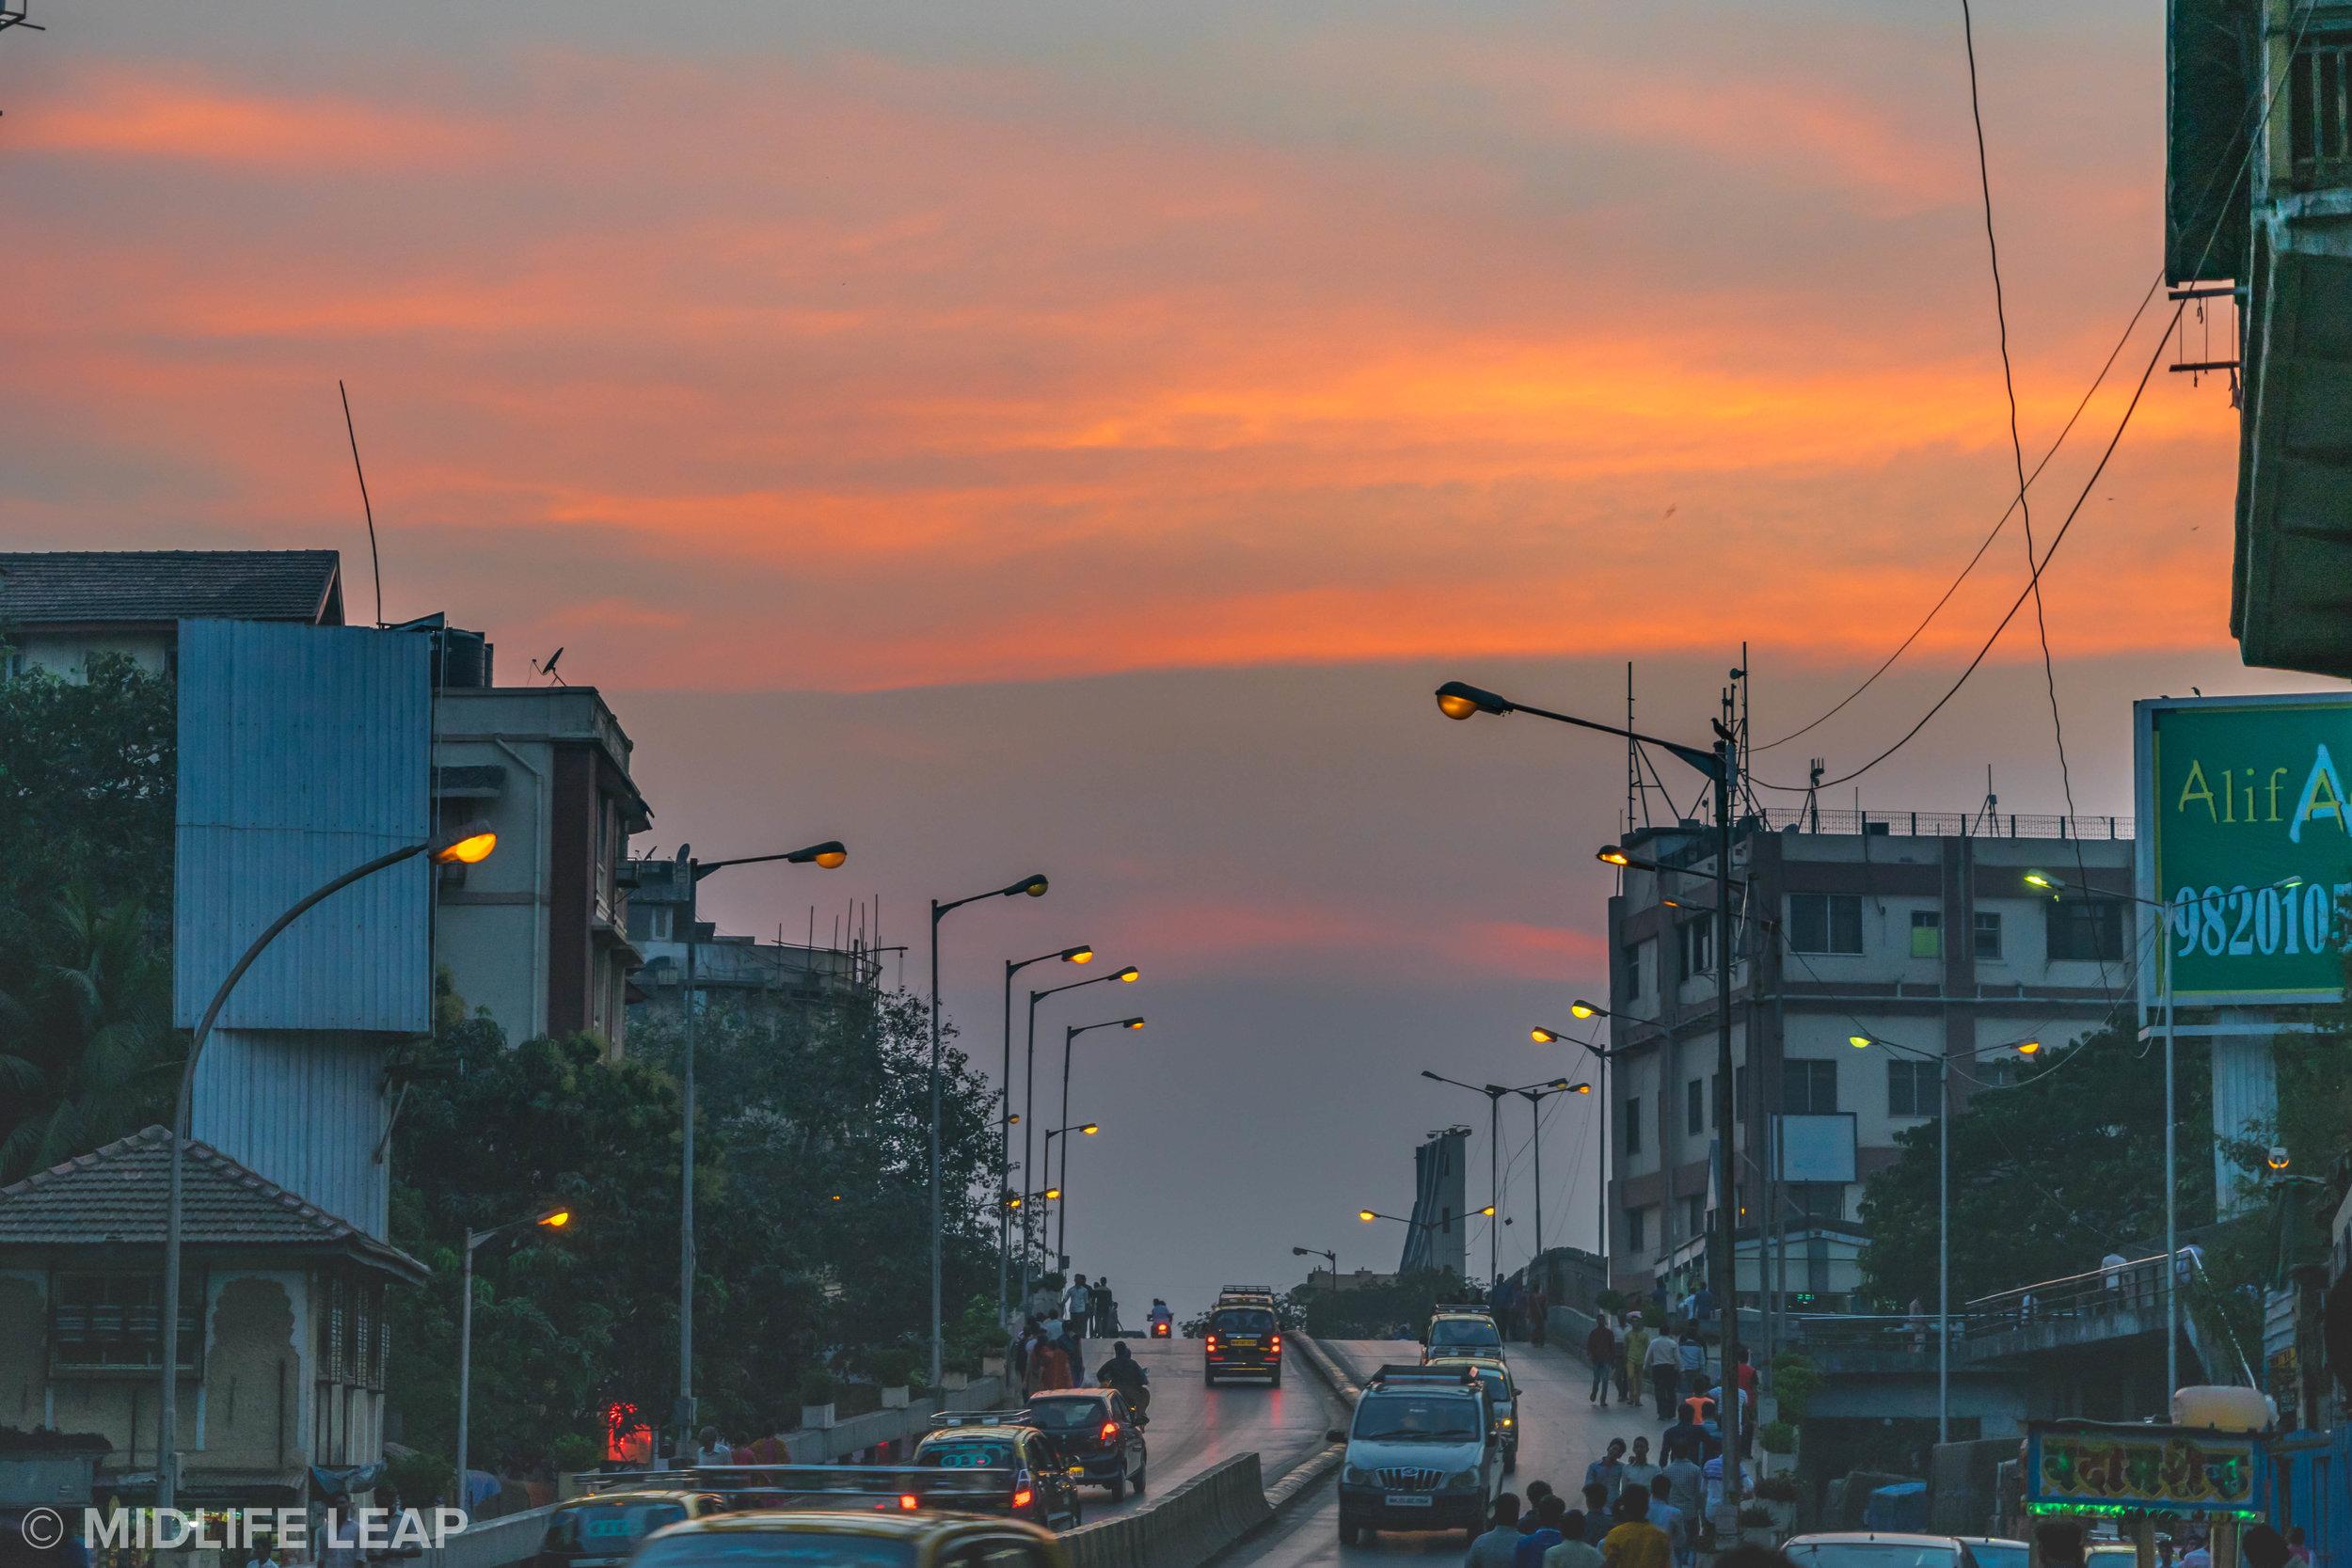 sunsets-in-mumbai-bombay-india